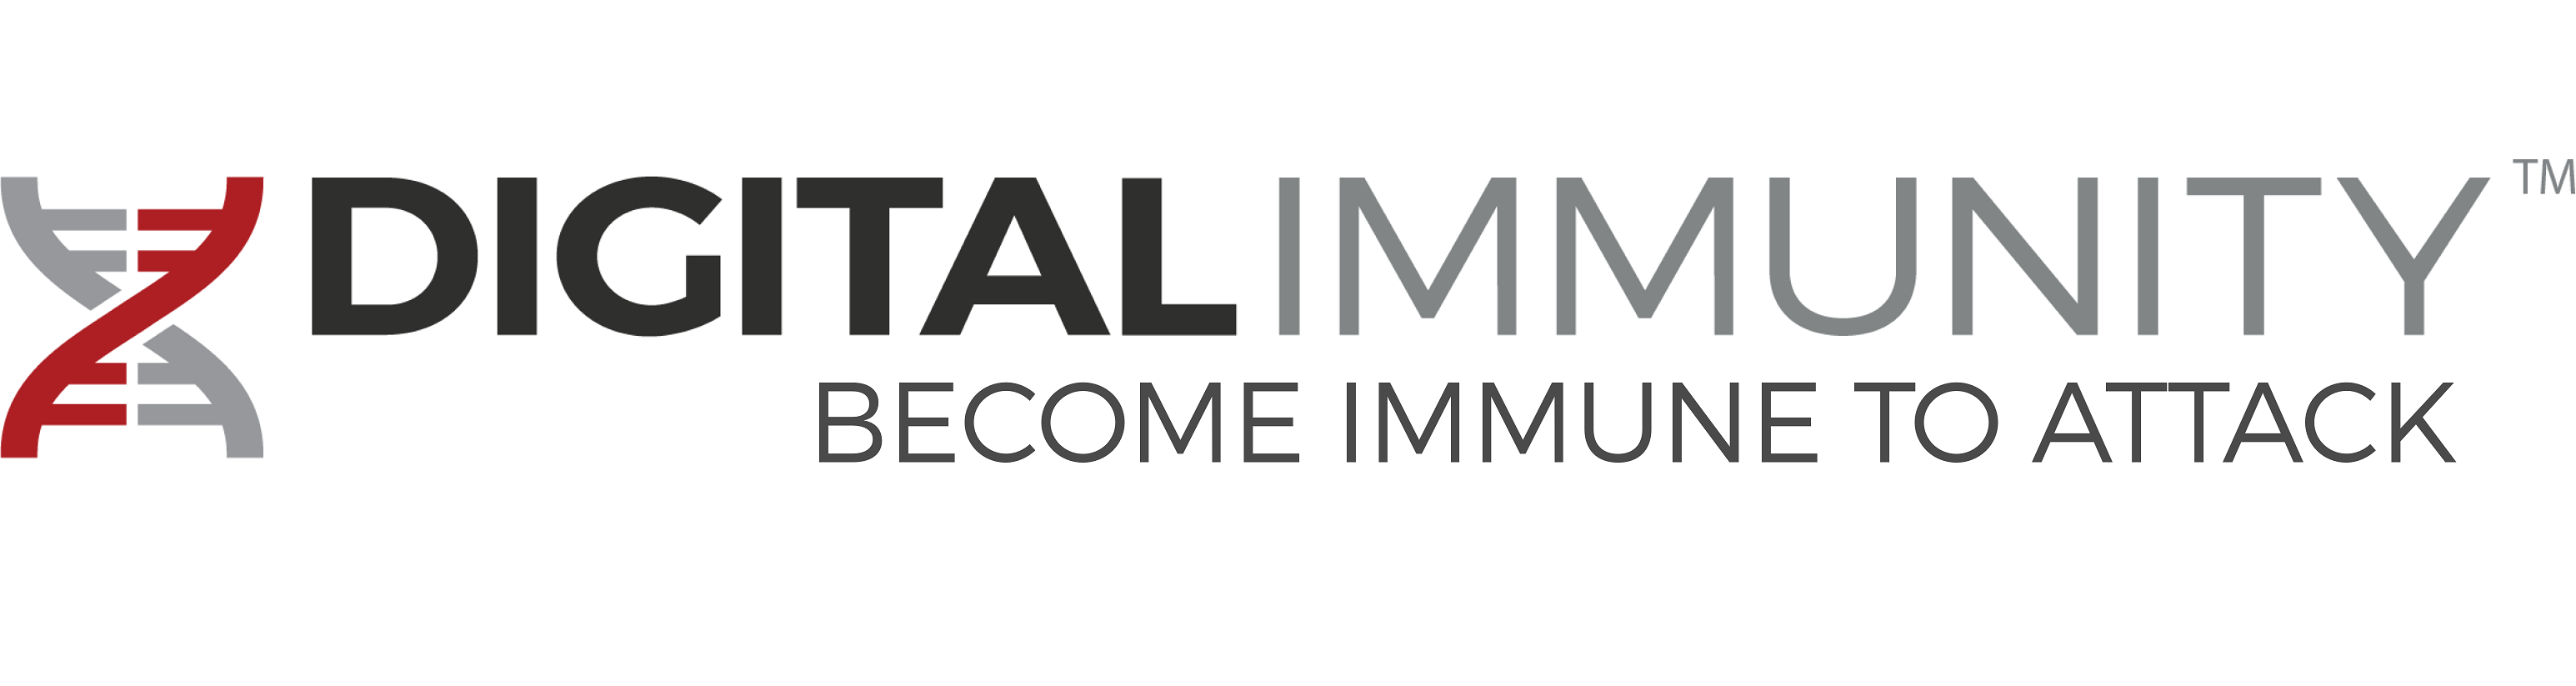 Digital Immunity